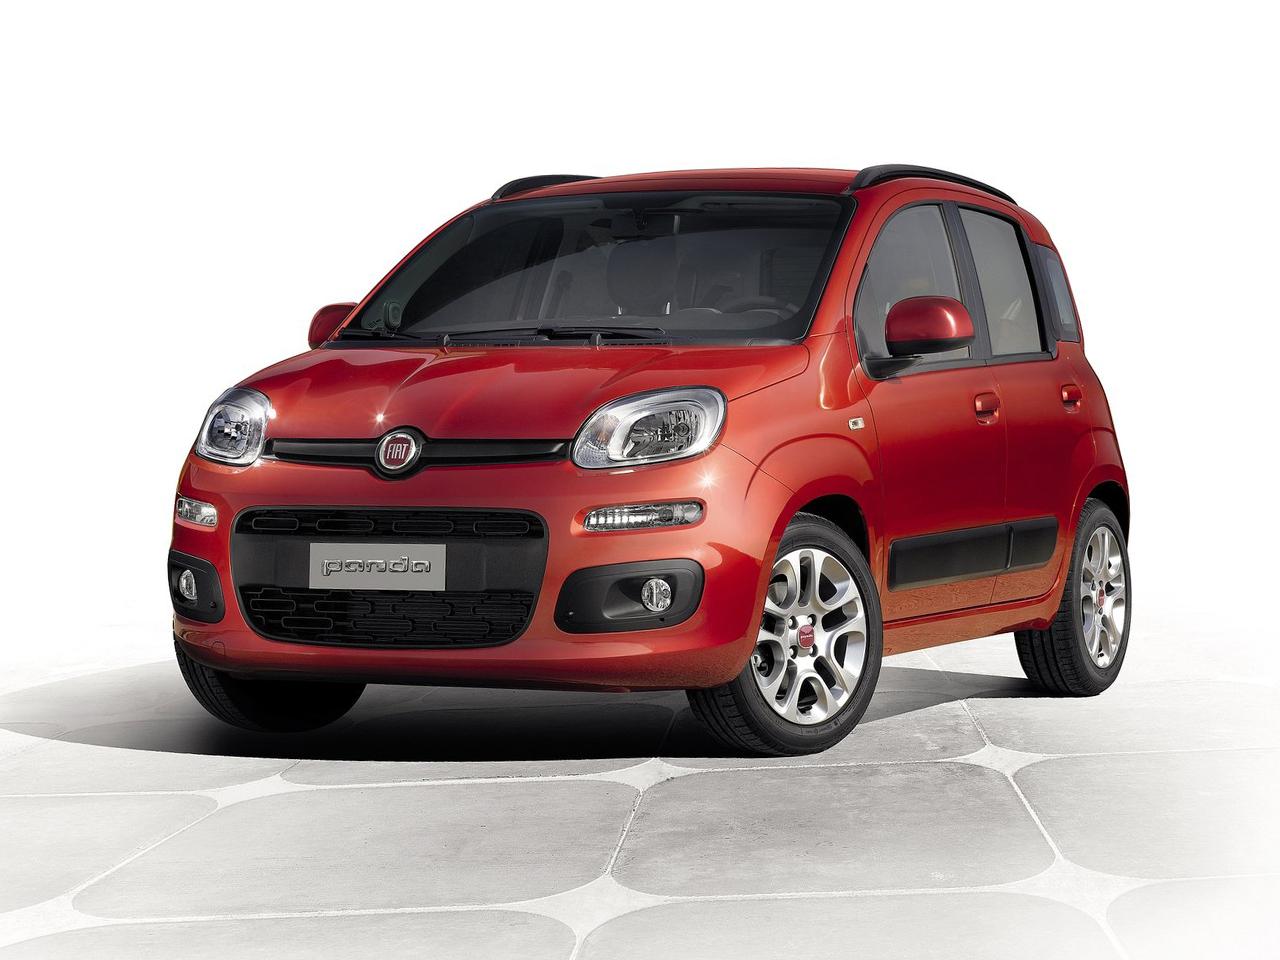 Fiat Panda exterior